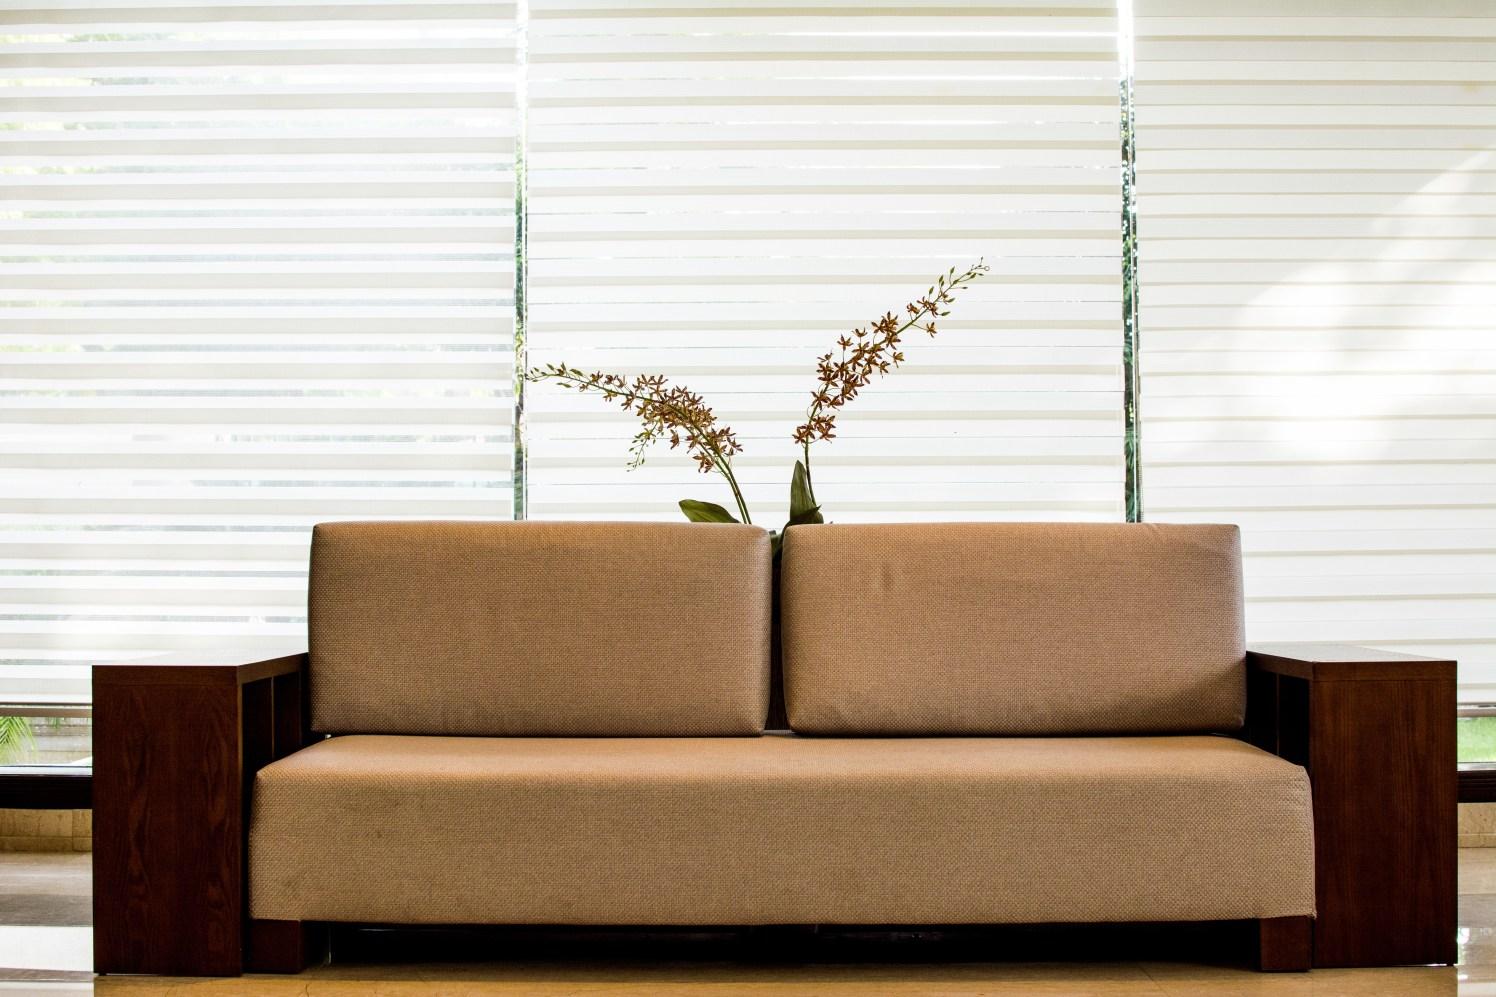 The cozy spot by VARUN KUMAR Living-room Contemporary | Interior Design Photos & Ideas